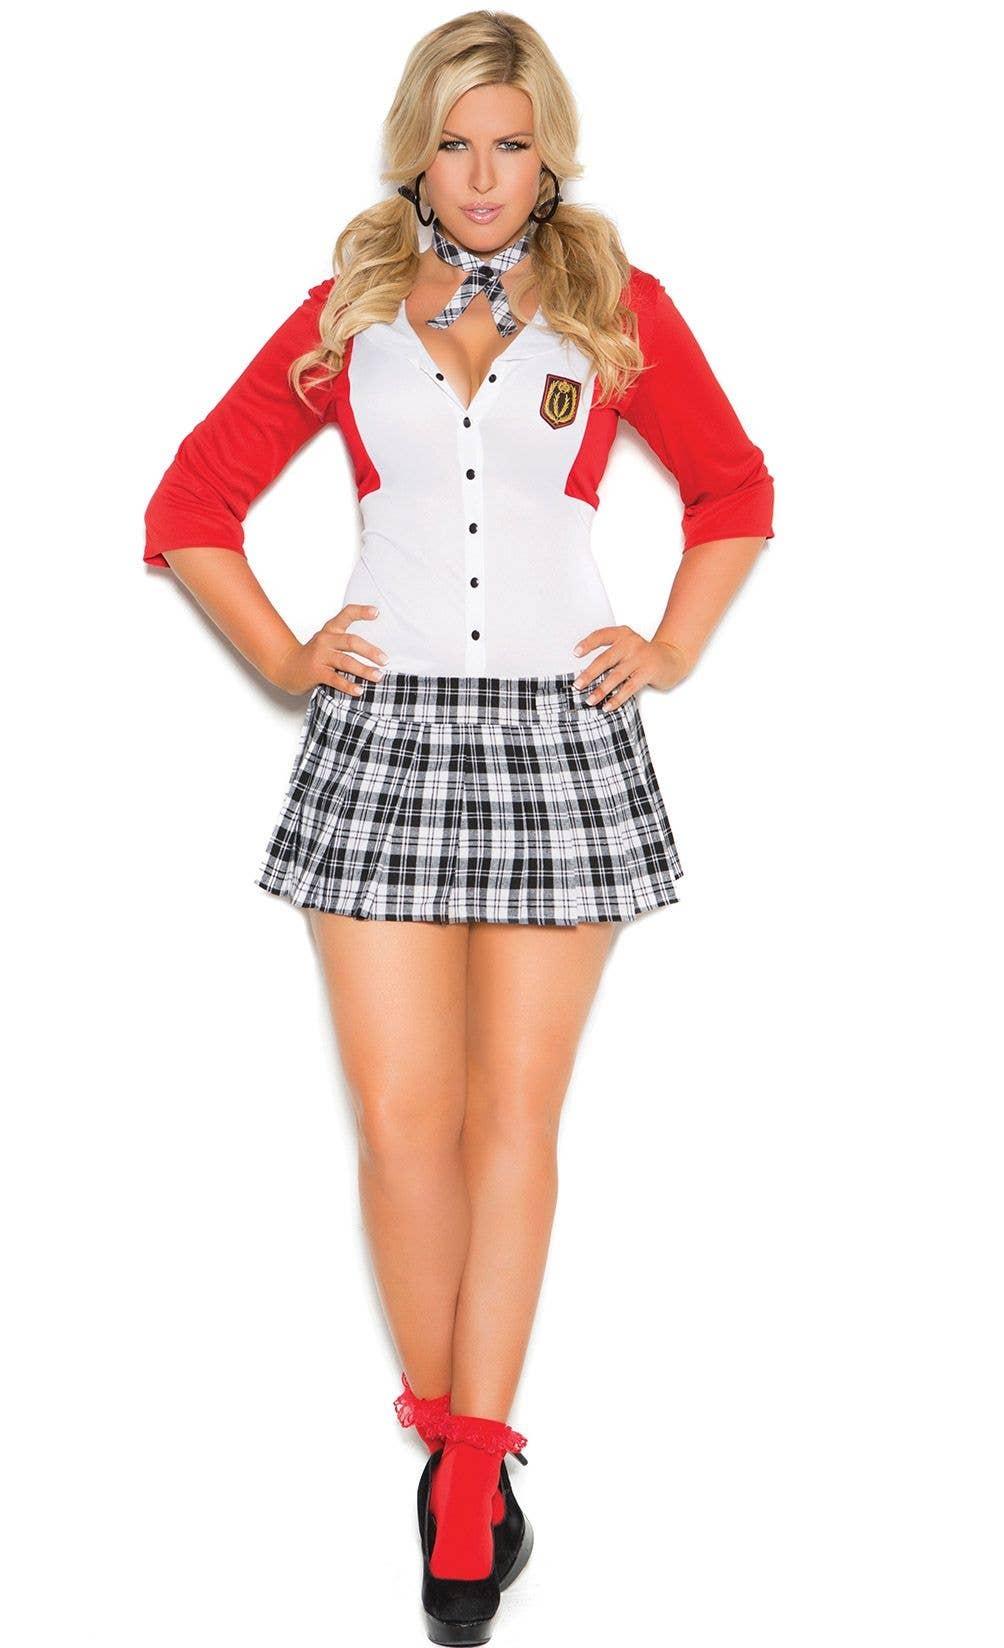 Ladies School Girl Red Tartan Skirt OTK Socks Tie World Book Day Fancy Dress